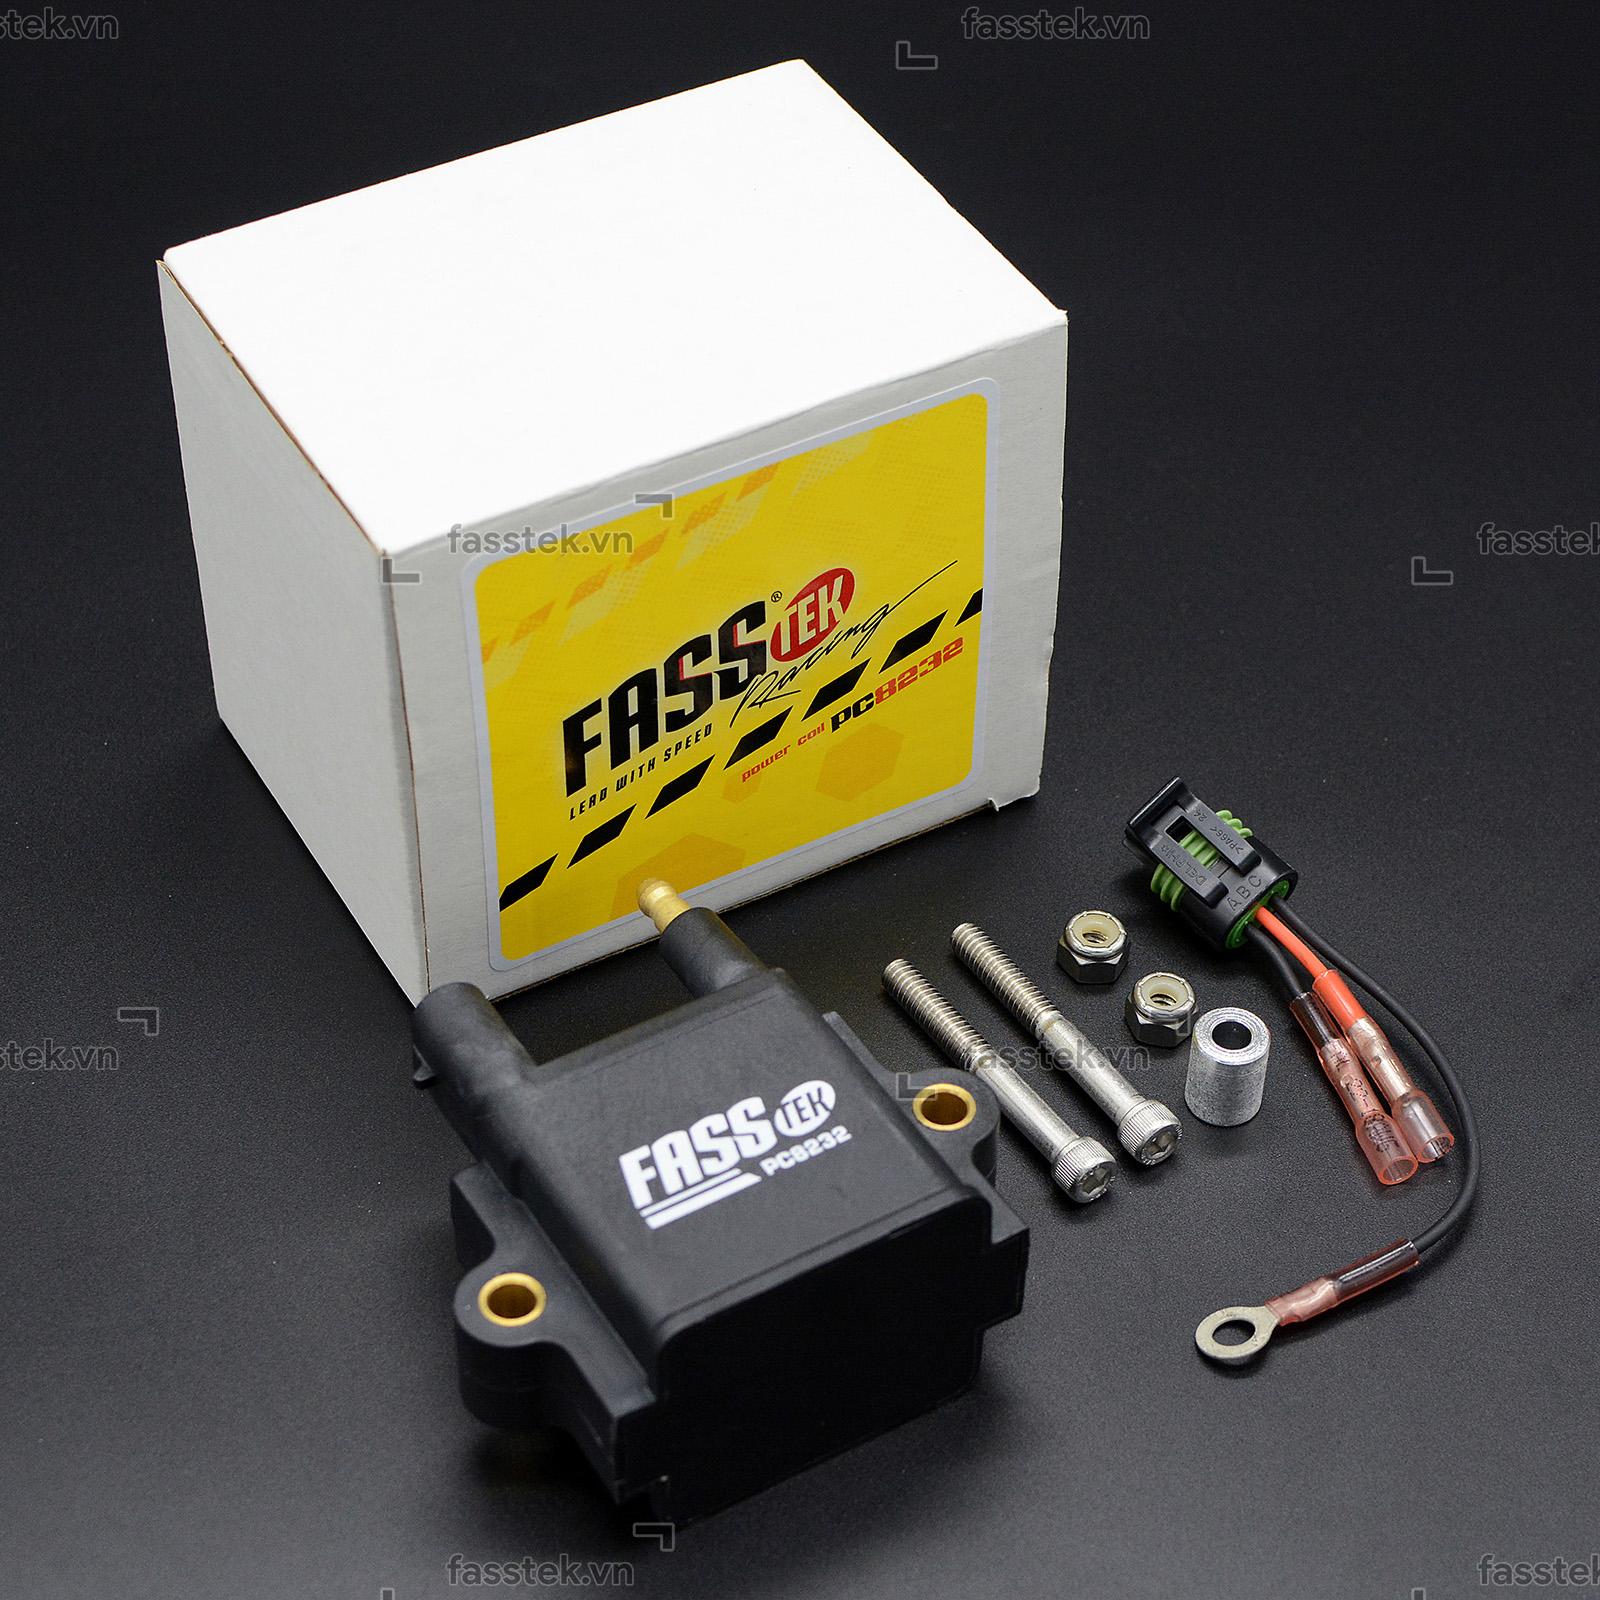 Mo-bin sườn Fasstek Racing PC8232 cho xe BXC